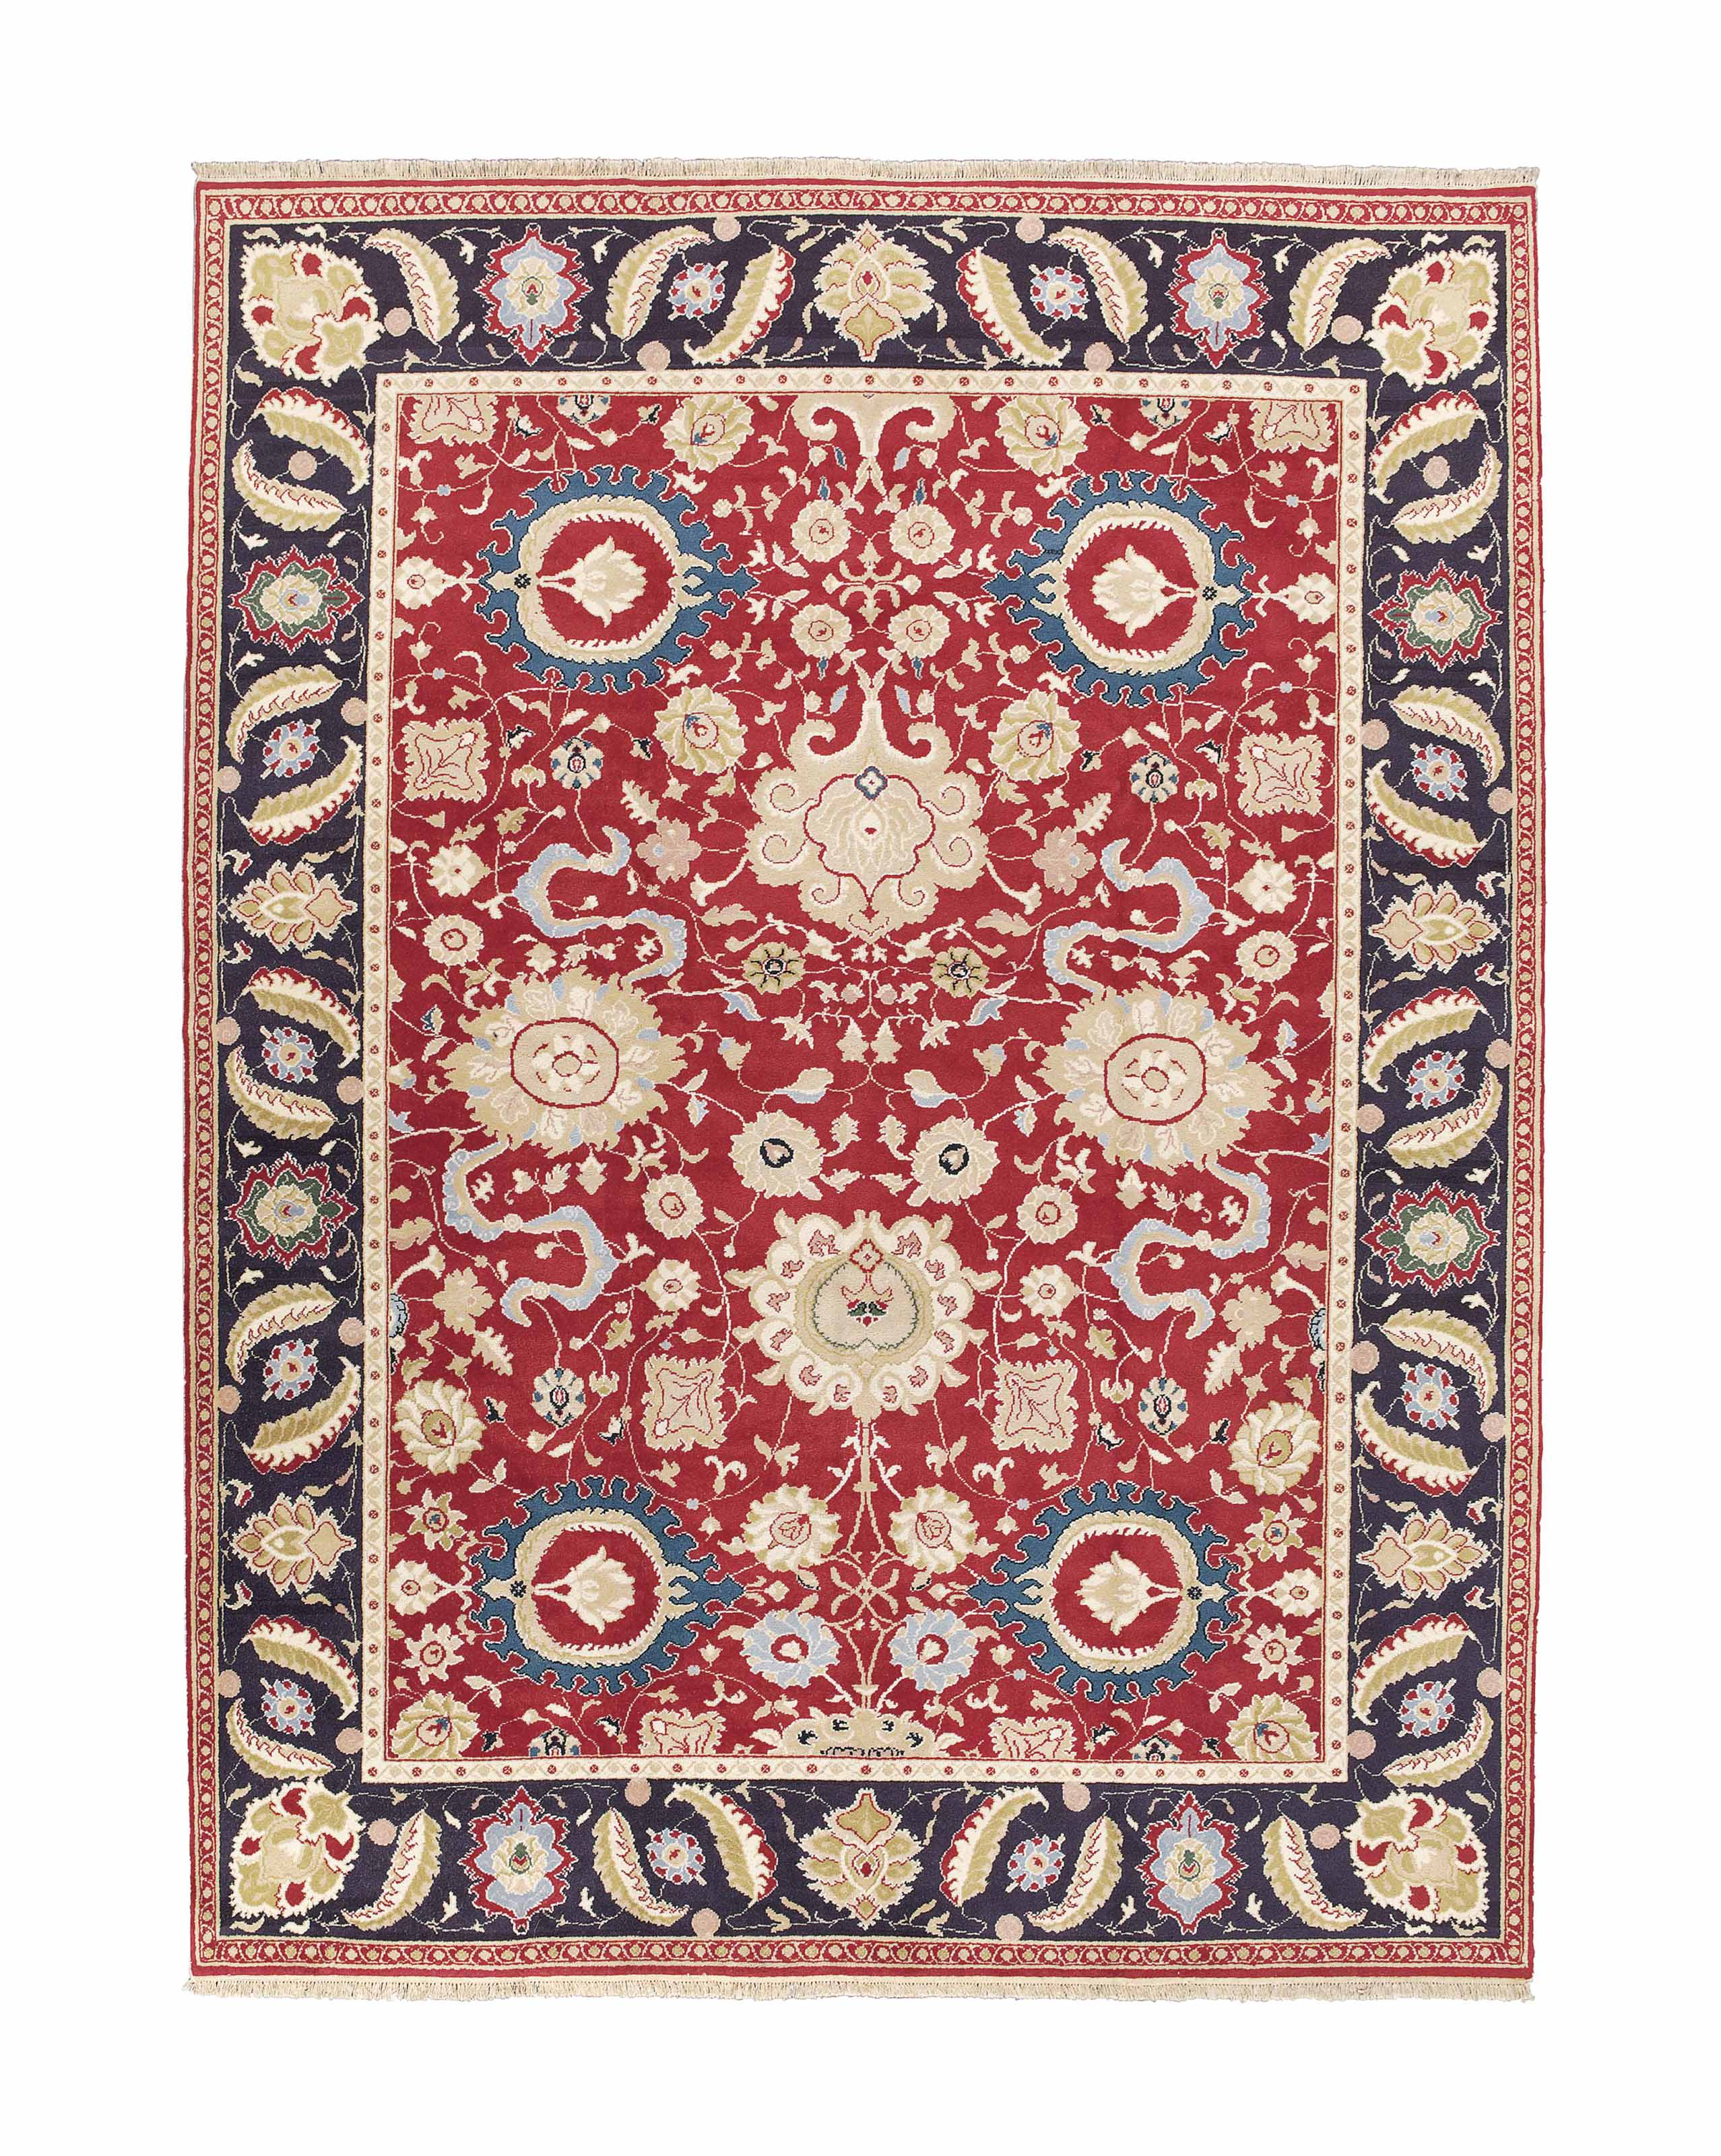 A fine Agra style carpet